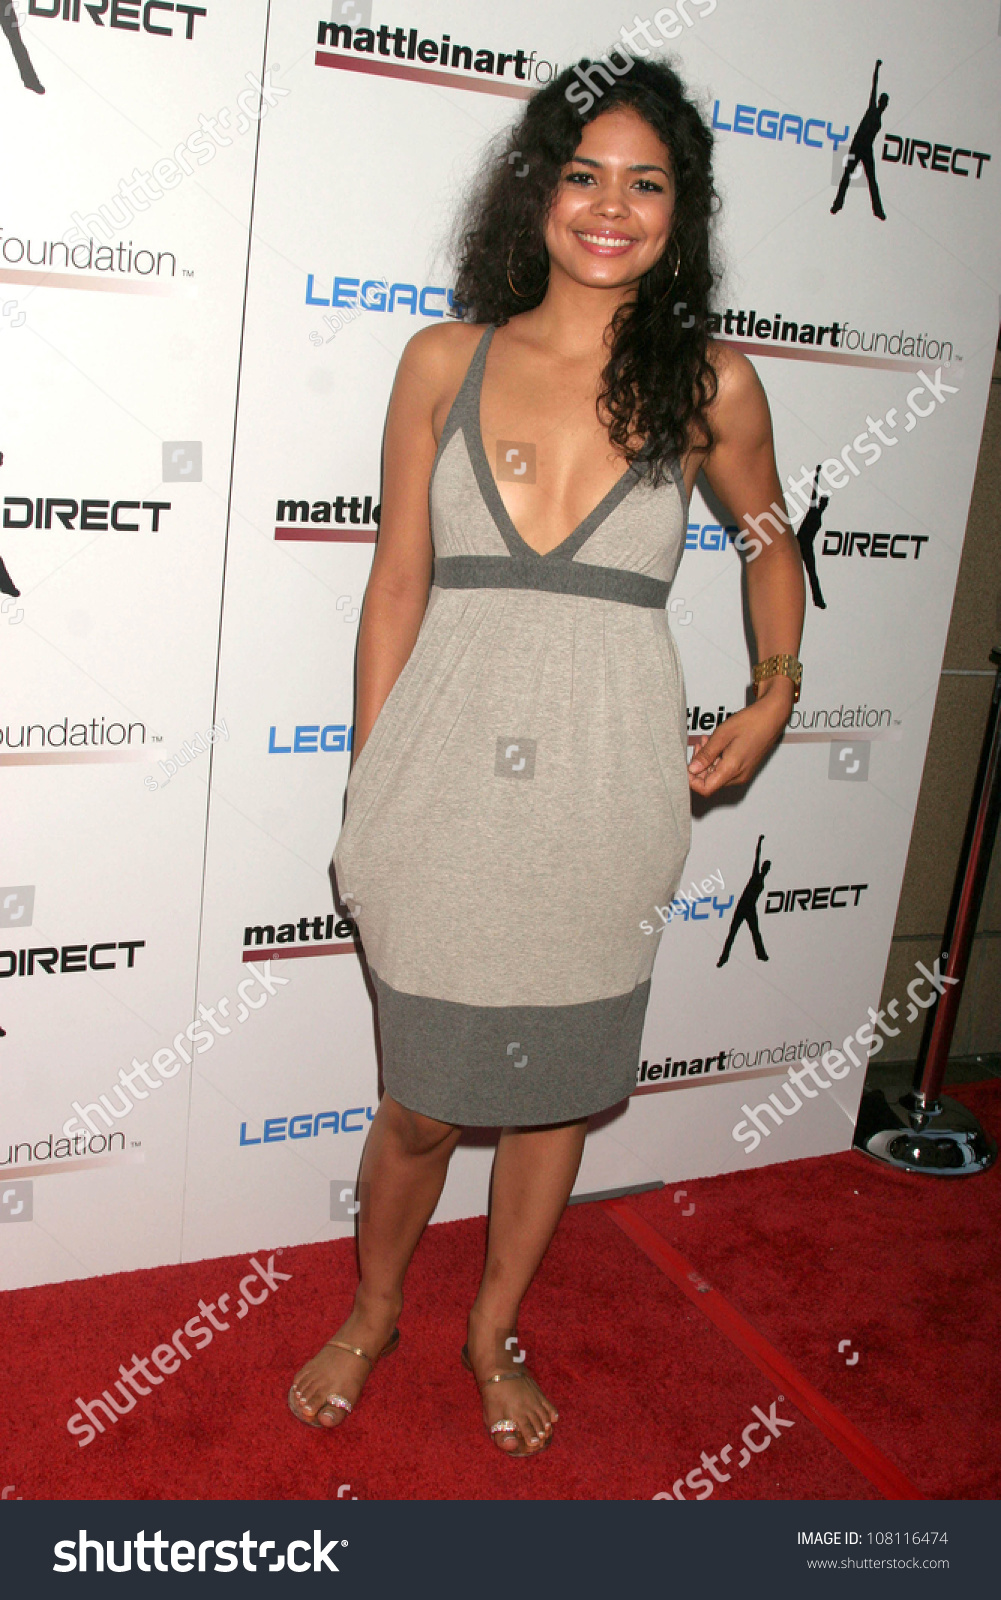 Aparna Dixit 2013,Rita La Roy XXX video Melissa Archer born December 2, 1979 (age 38),Lenore Kasdorf